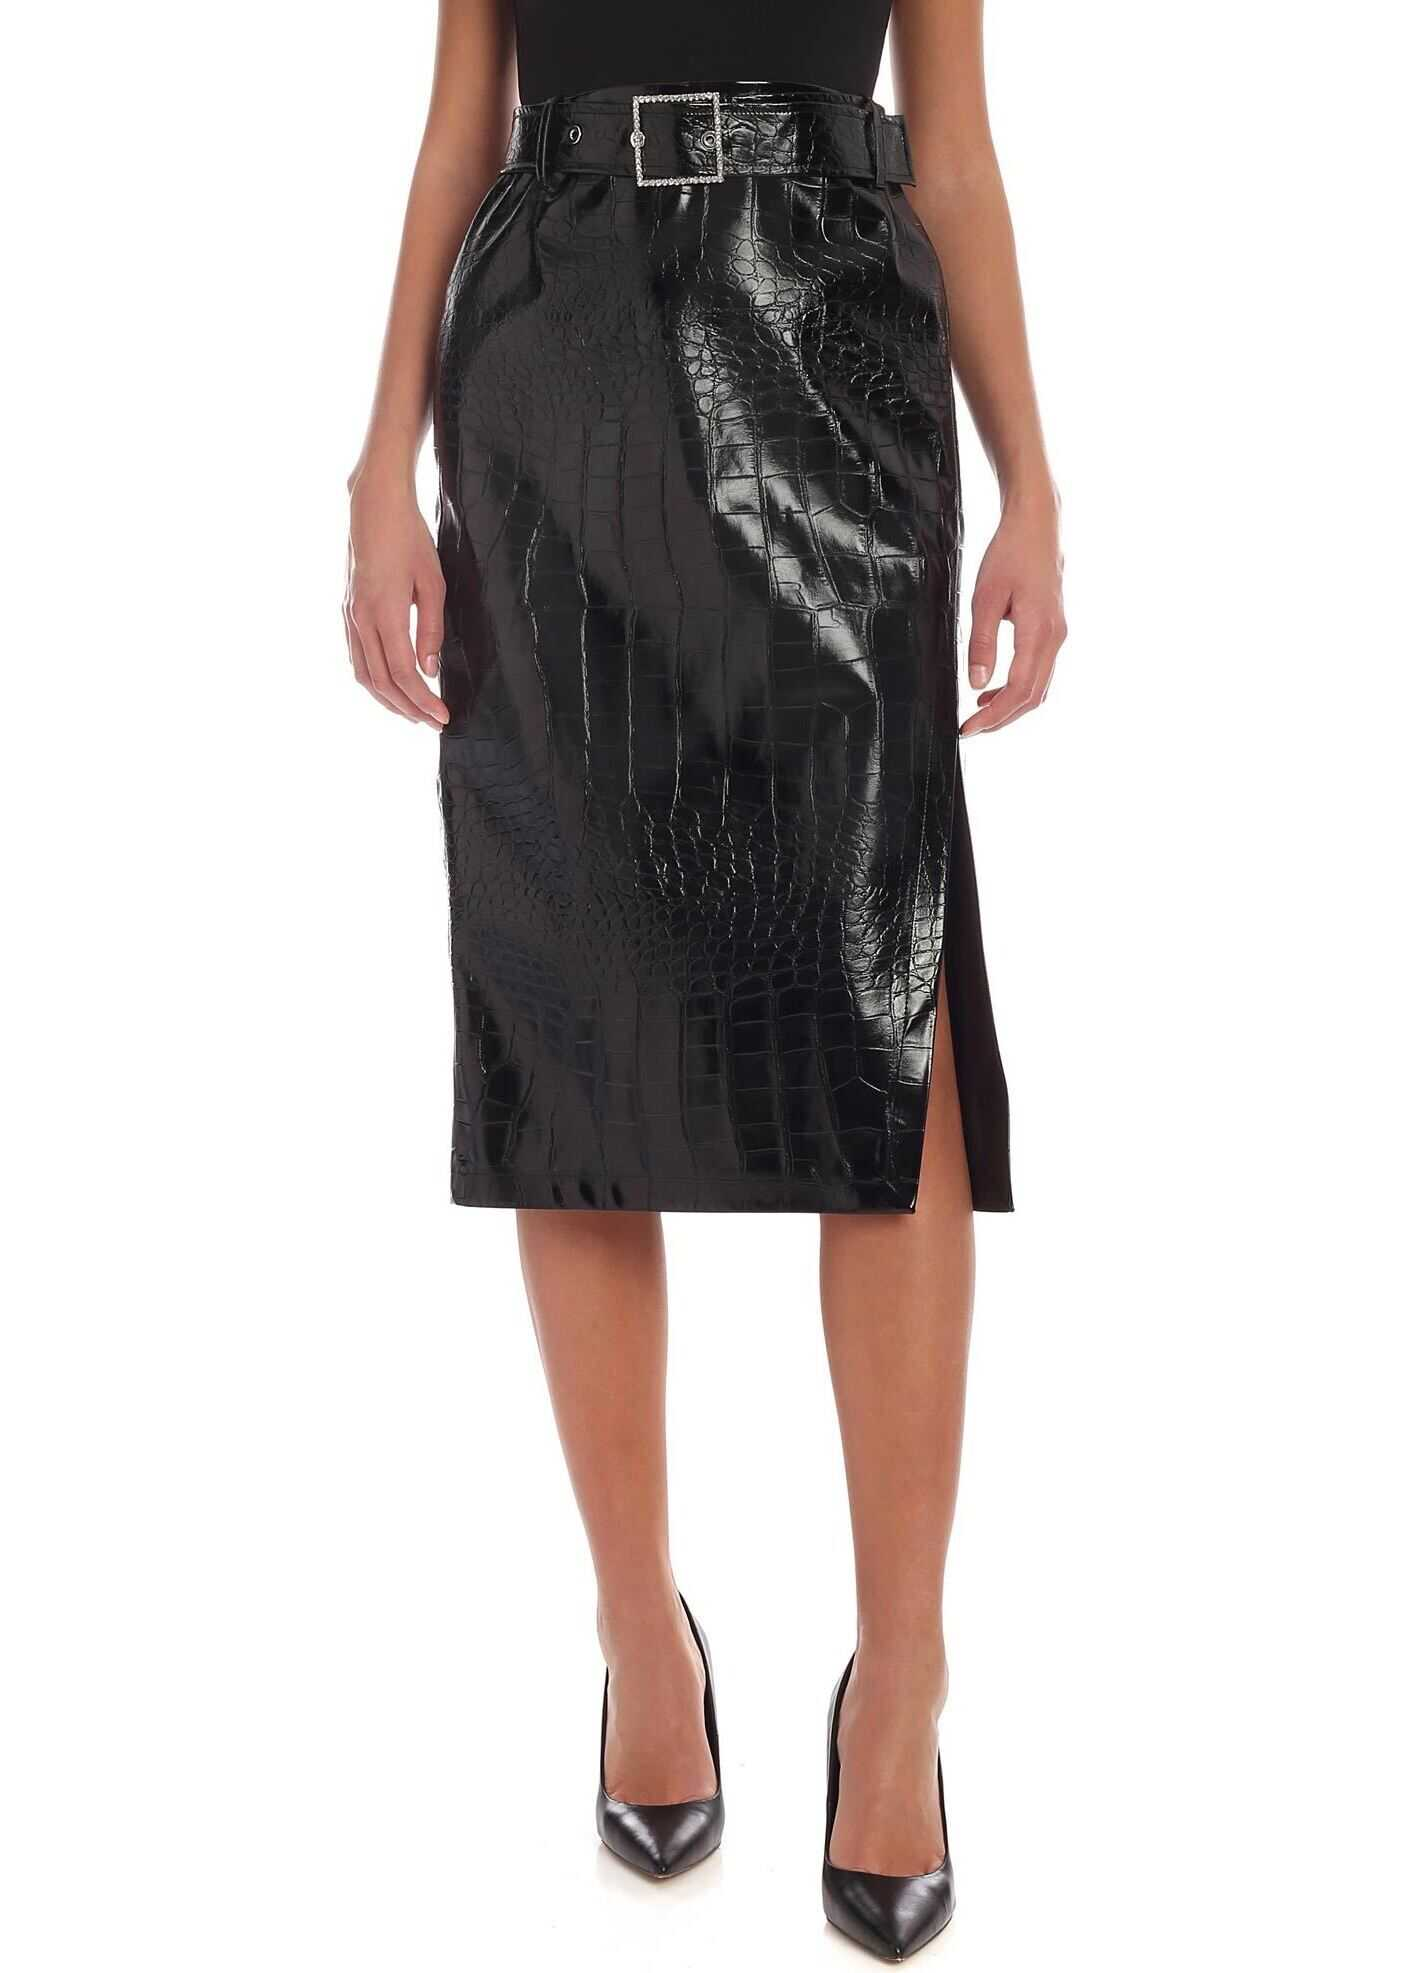 Pinko Oronero Skirt In Black Black